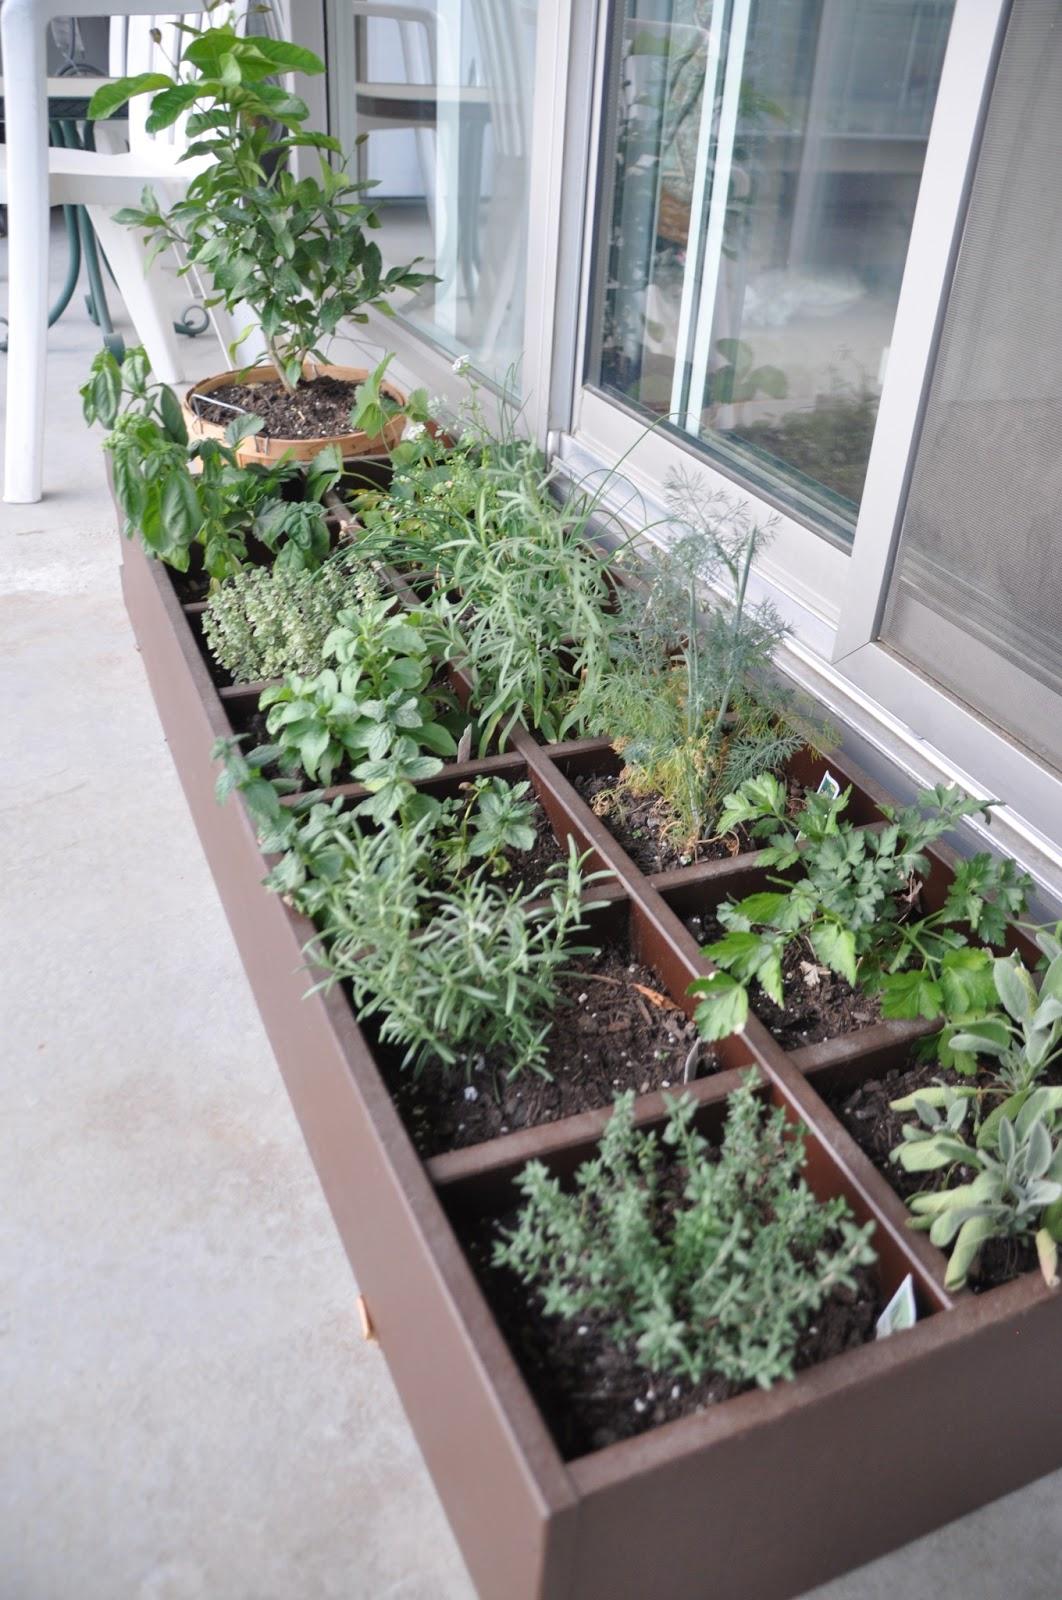 Sew Lah Tea Dough Diy Cd Rack Turned Herb Garden